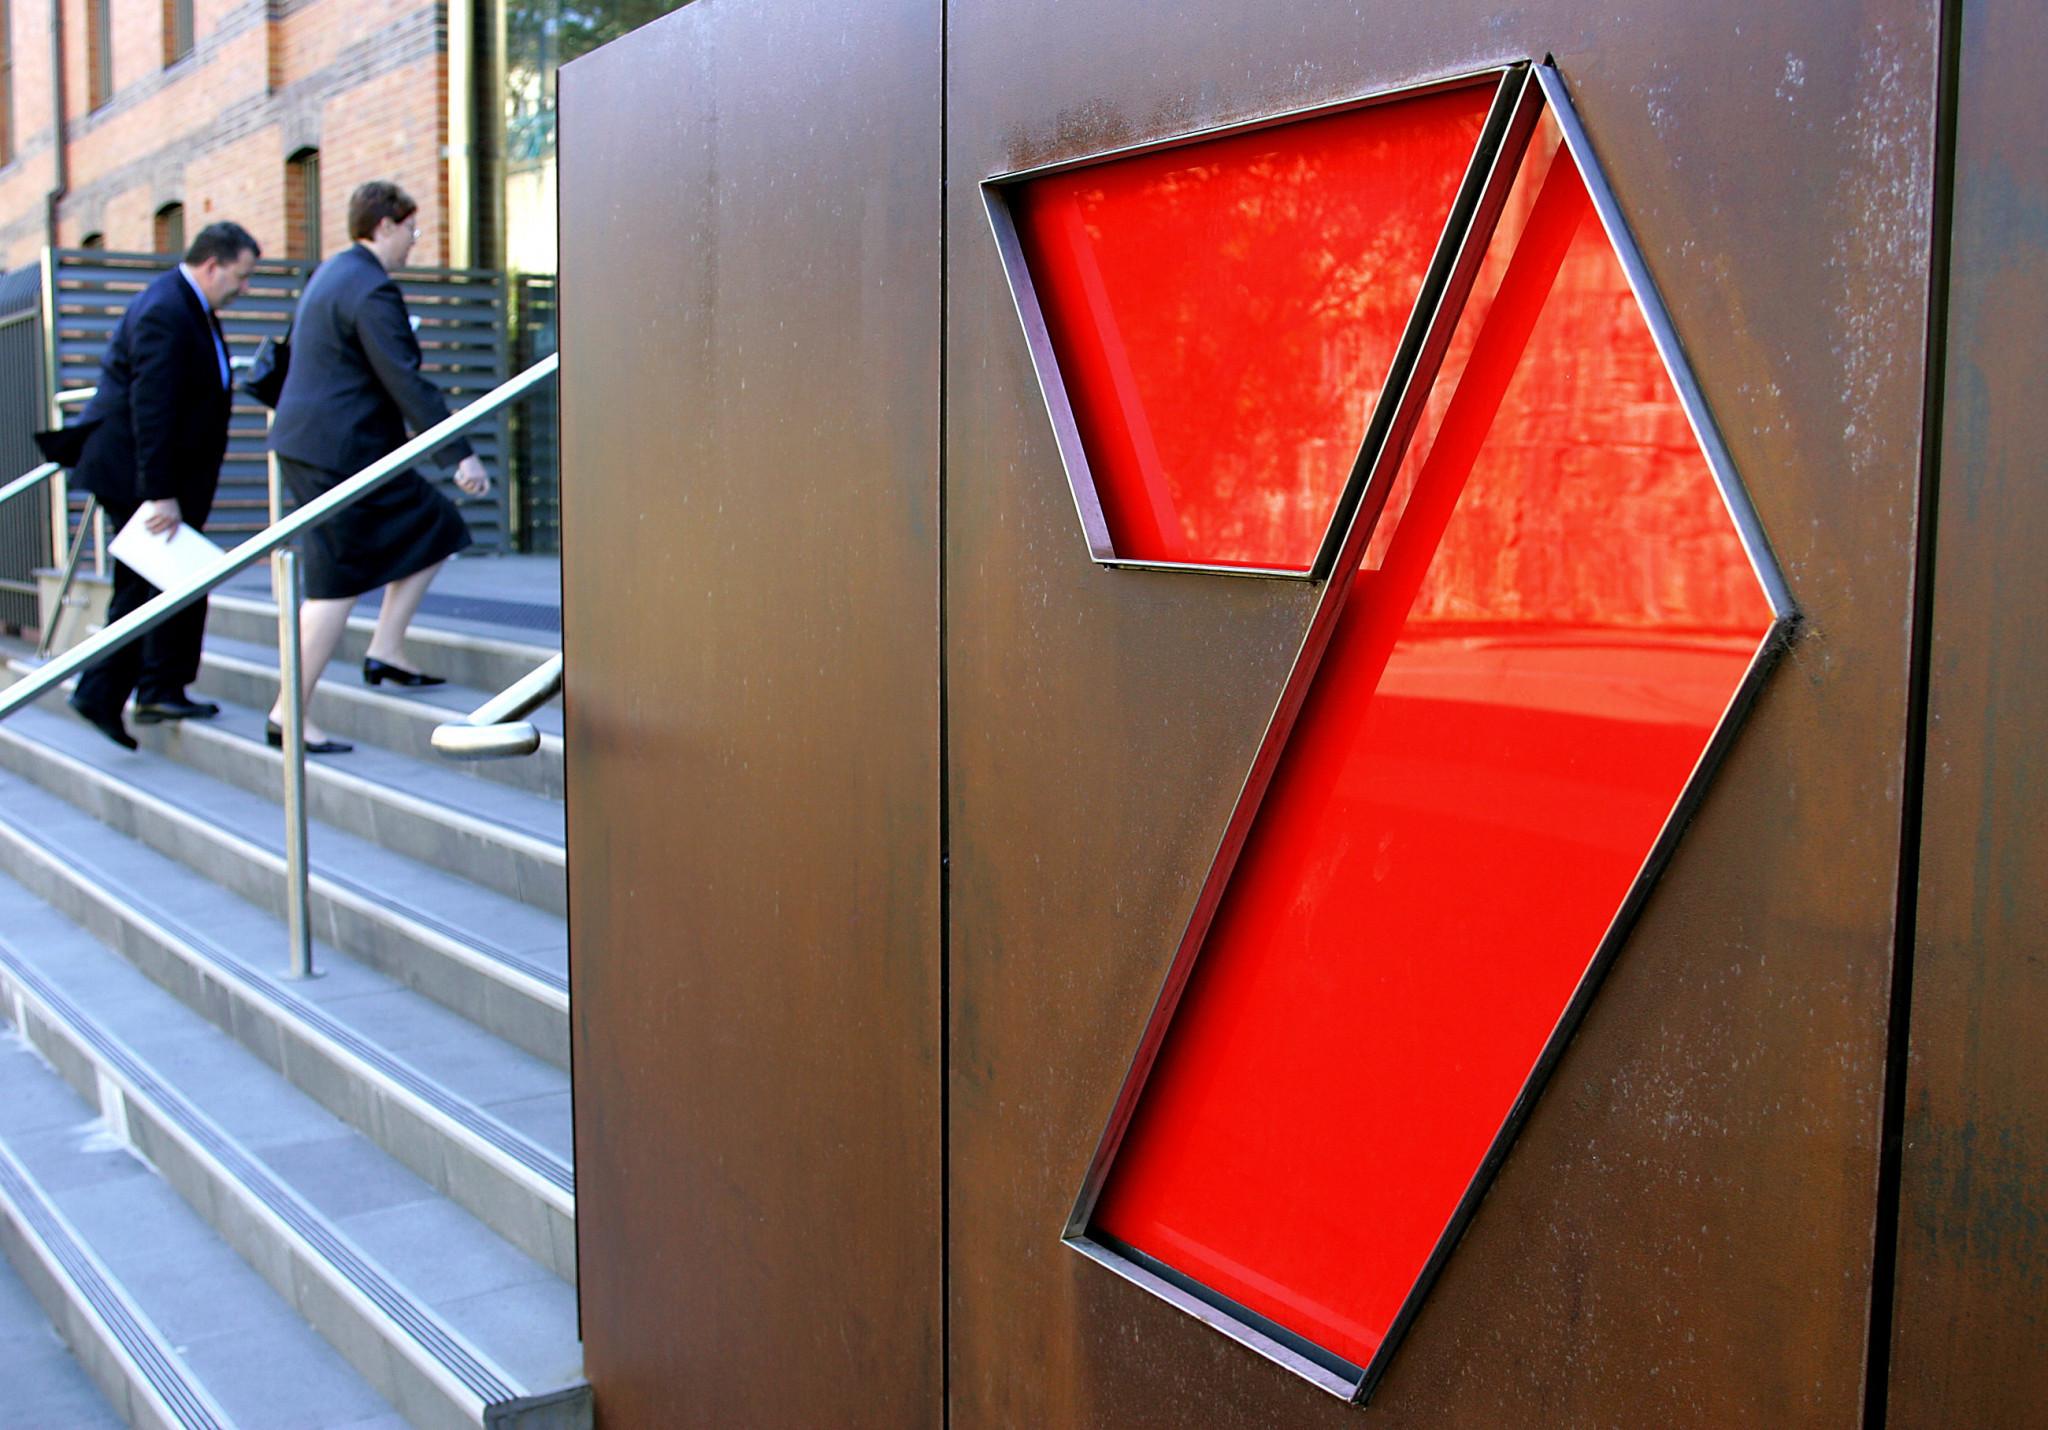 Seven Network to broadcast Birmingham 2022 Commonwealth Games in Australia